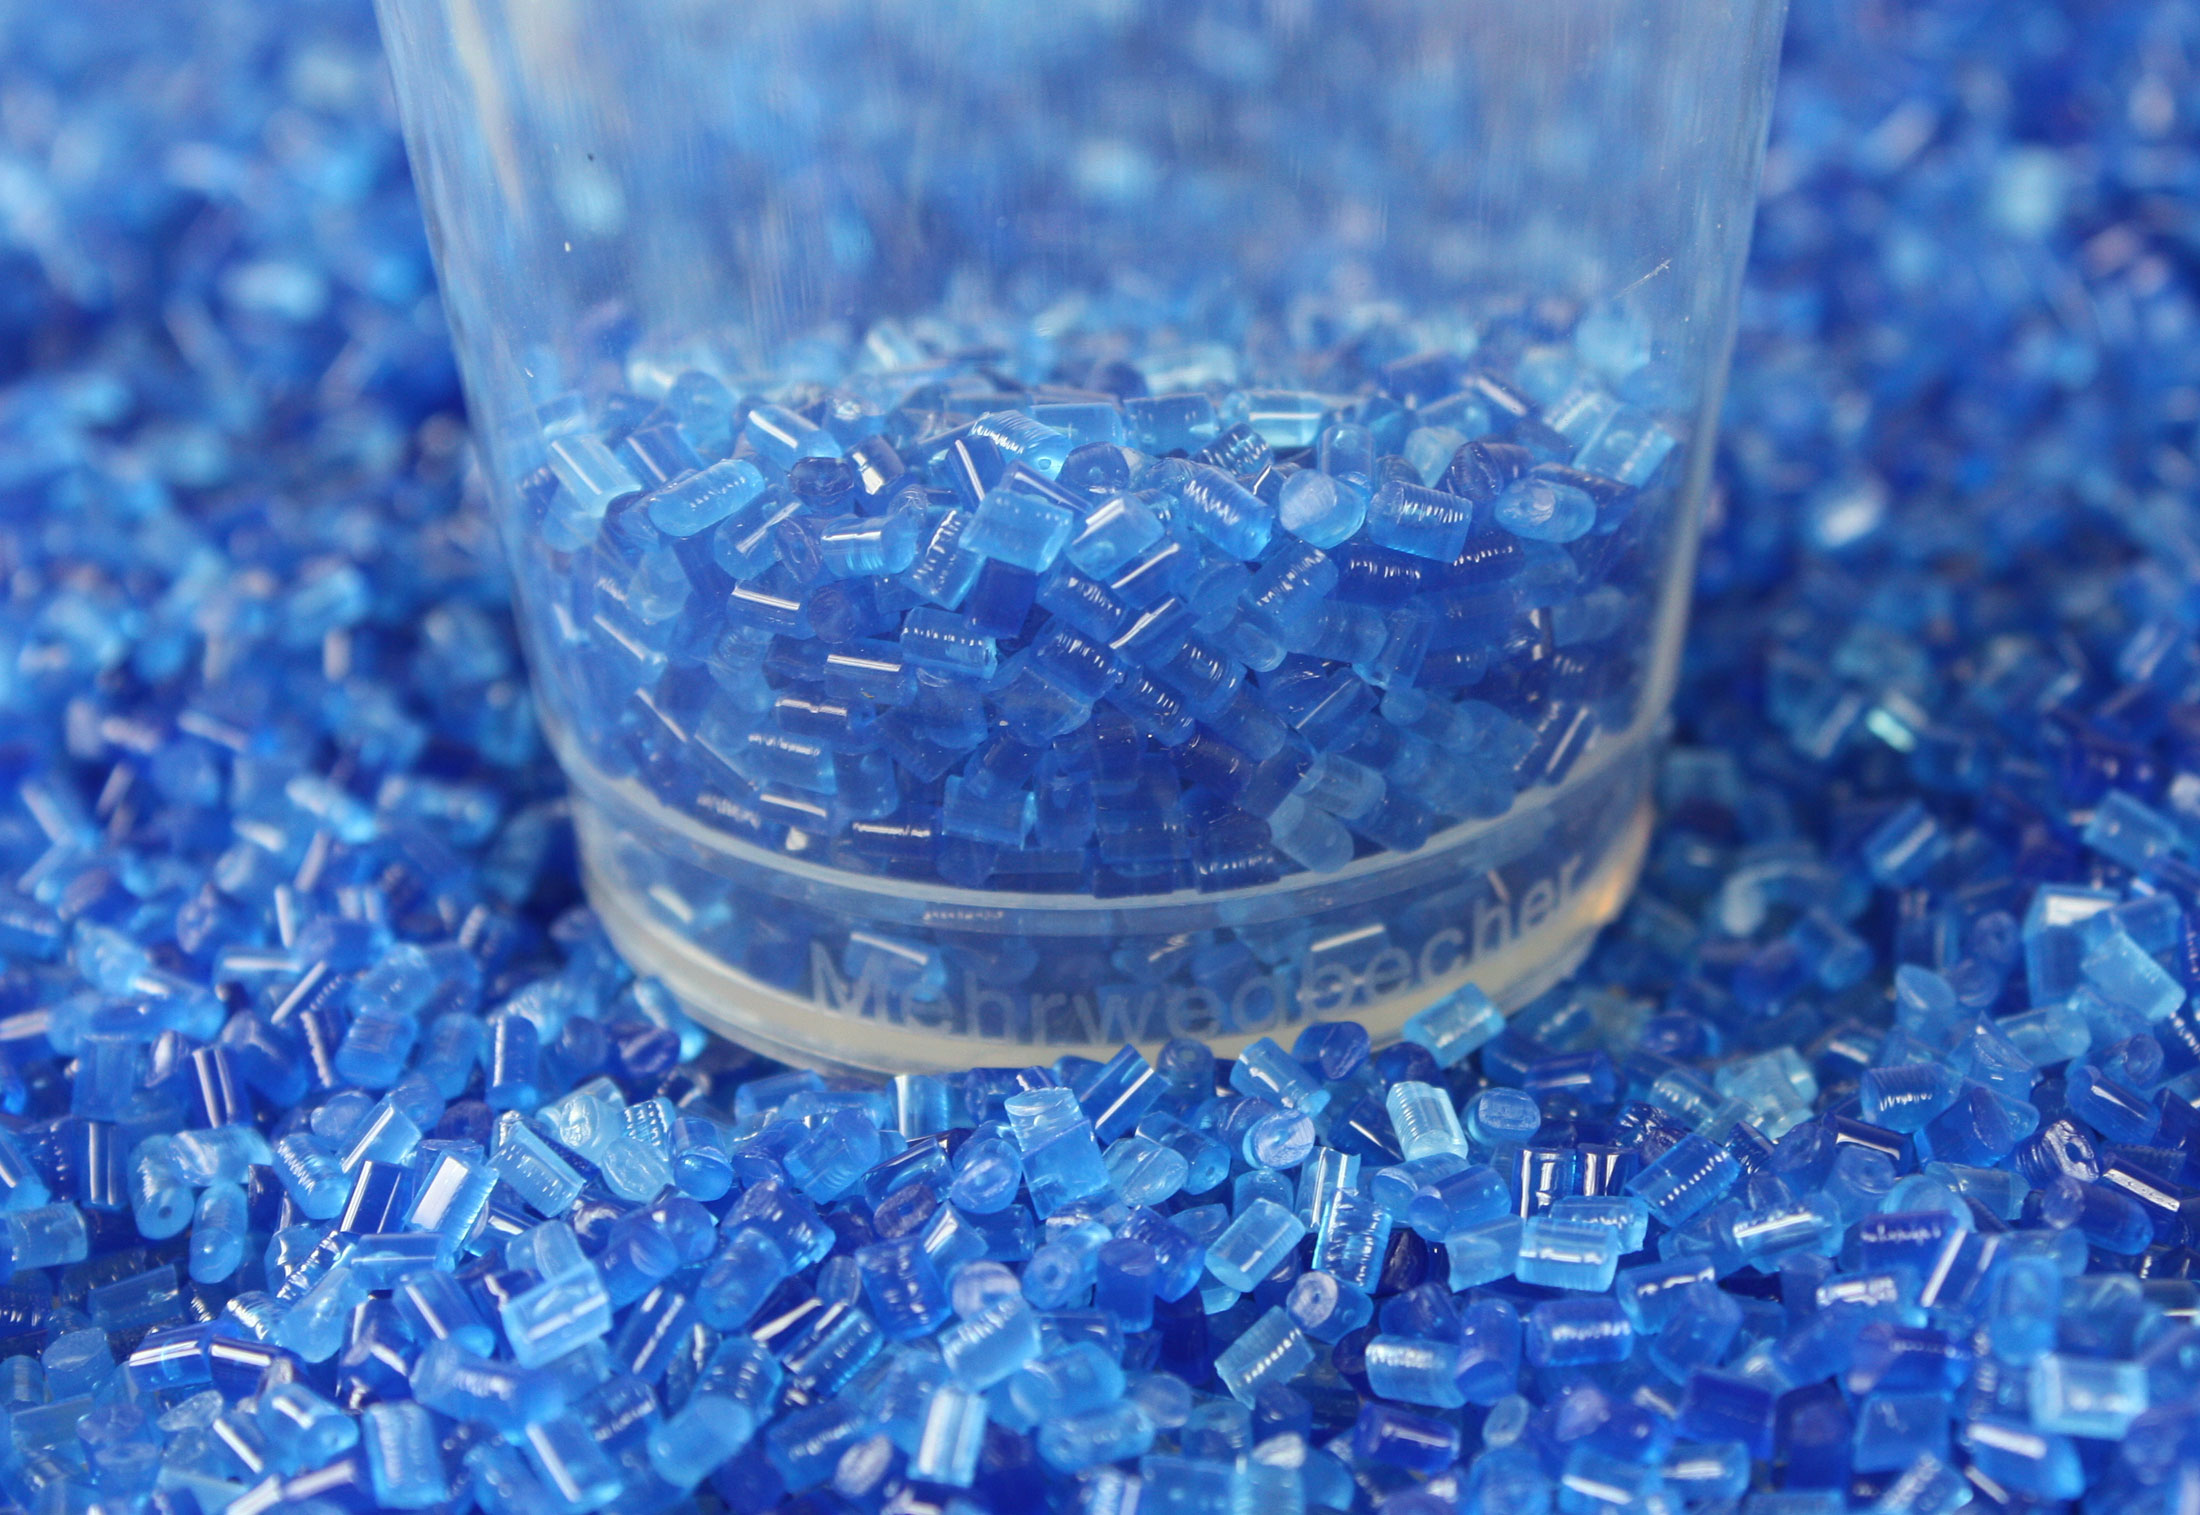 Metocene | transparency | natural by LyondellBasell | STYLEPARK